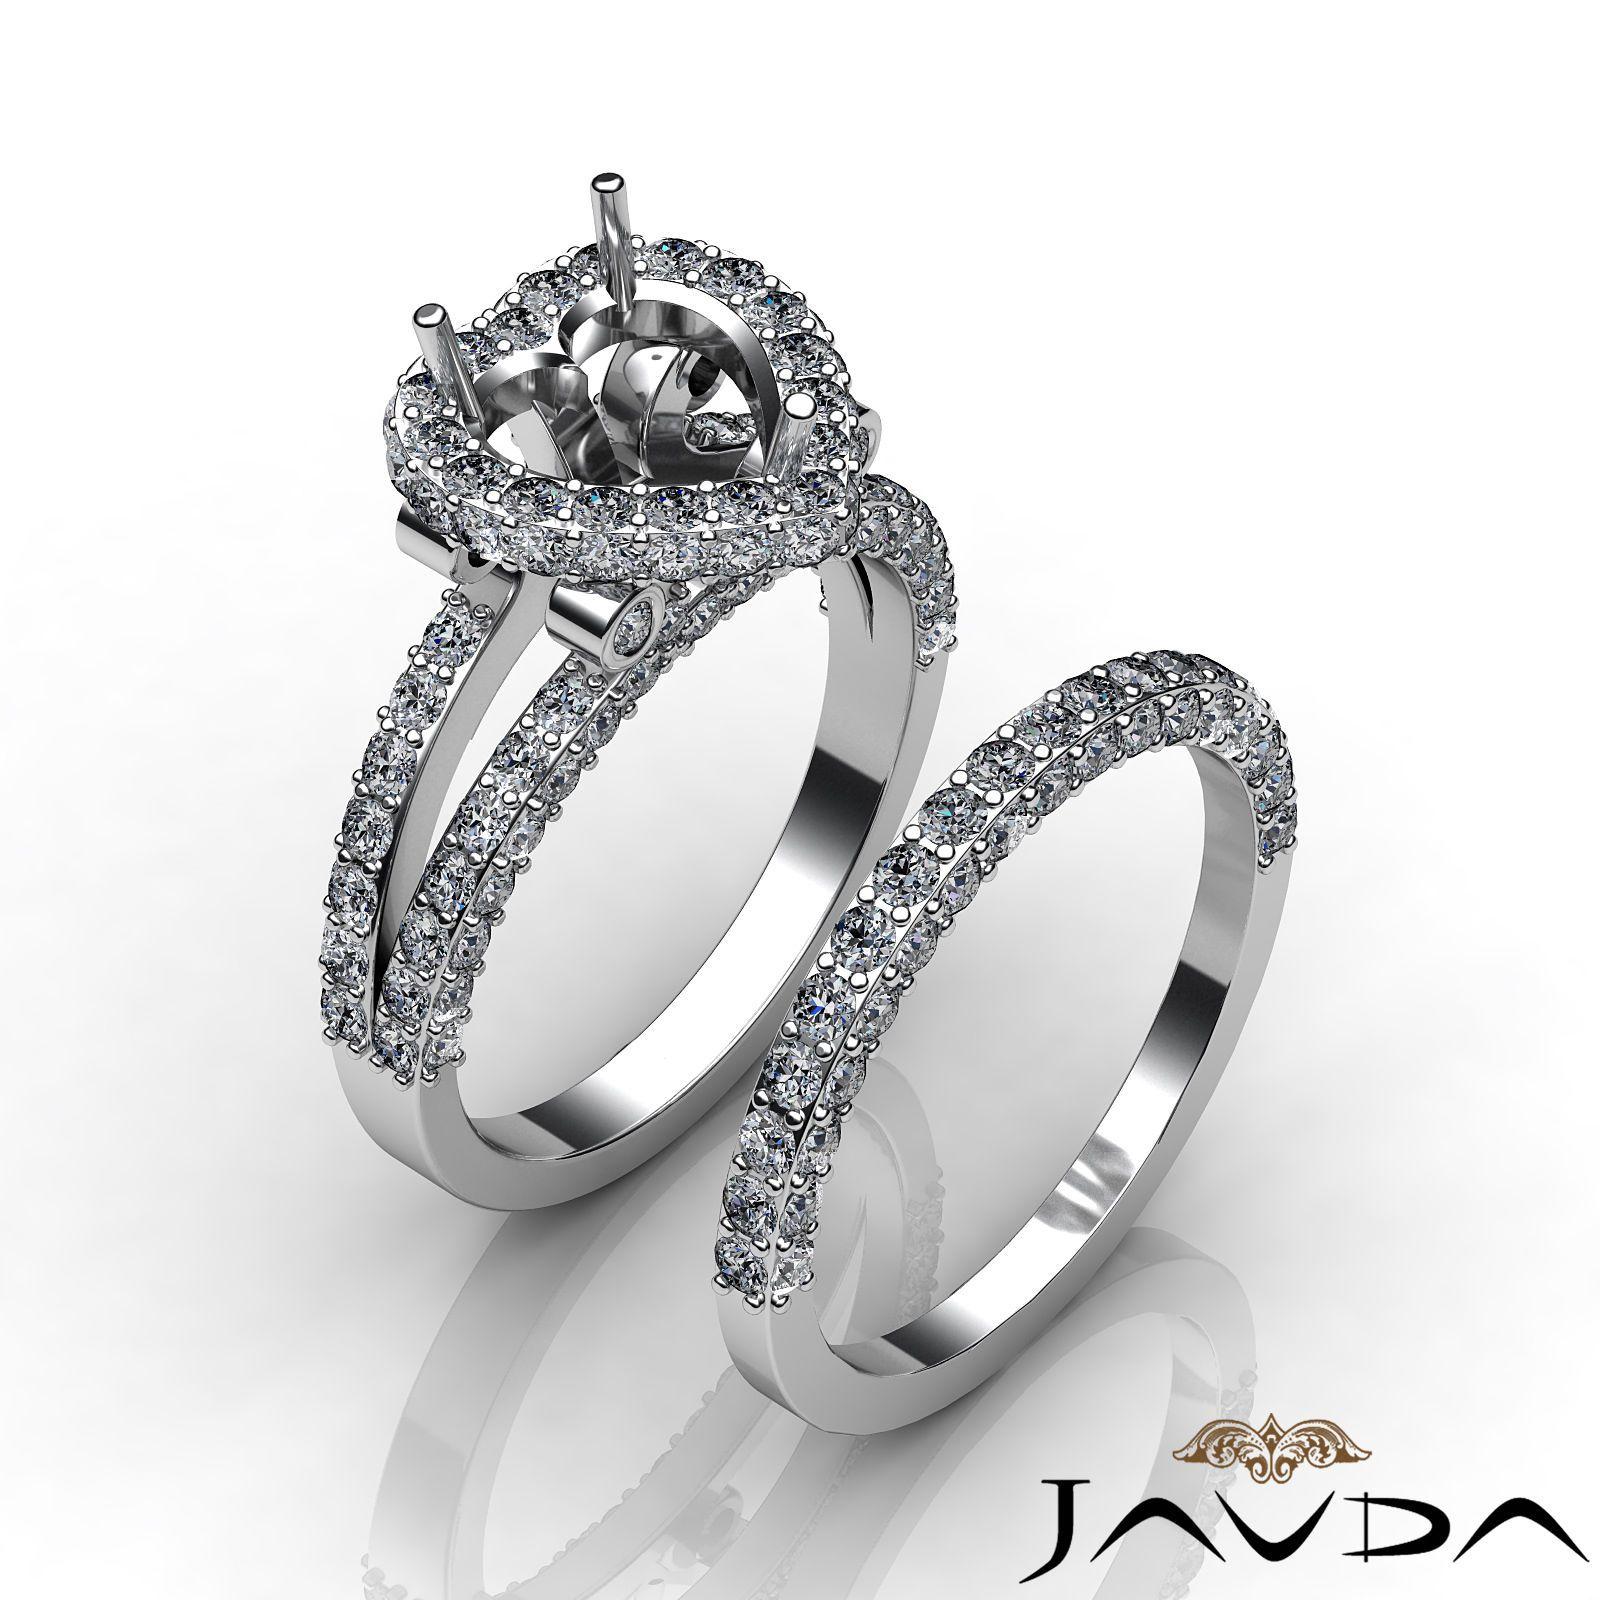 ebay wedding ring sets Pave Diamond Engagement Ring Heart Bridal Setting Platinum Semi Mount 2 75ct eBay